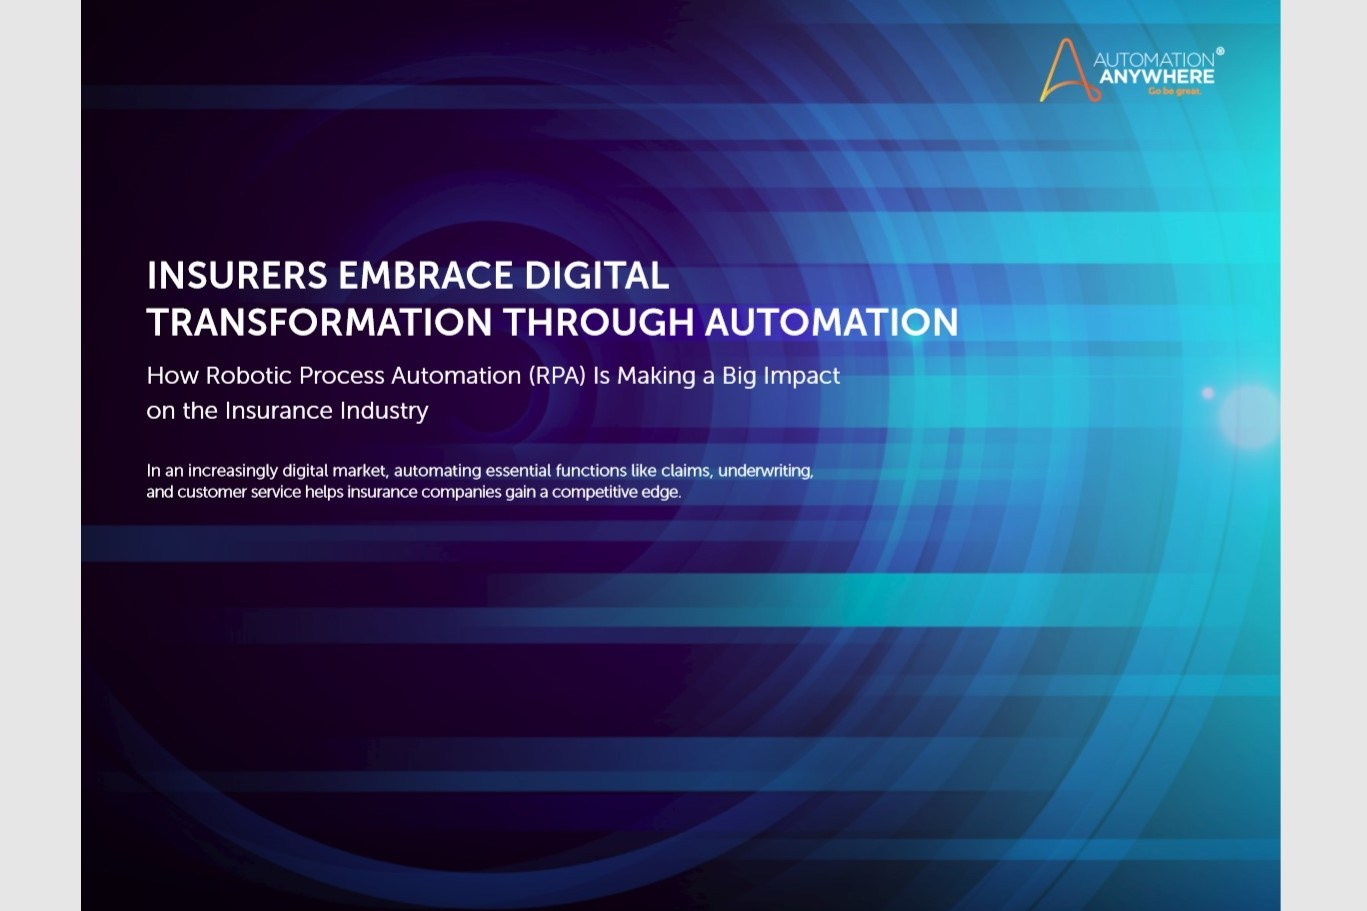 [Whitepaper] Insurers embrace digital transformation through automation